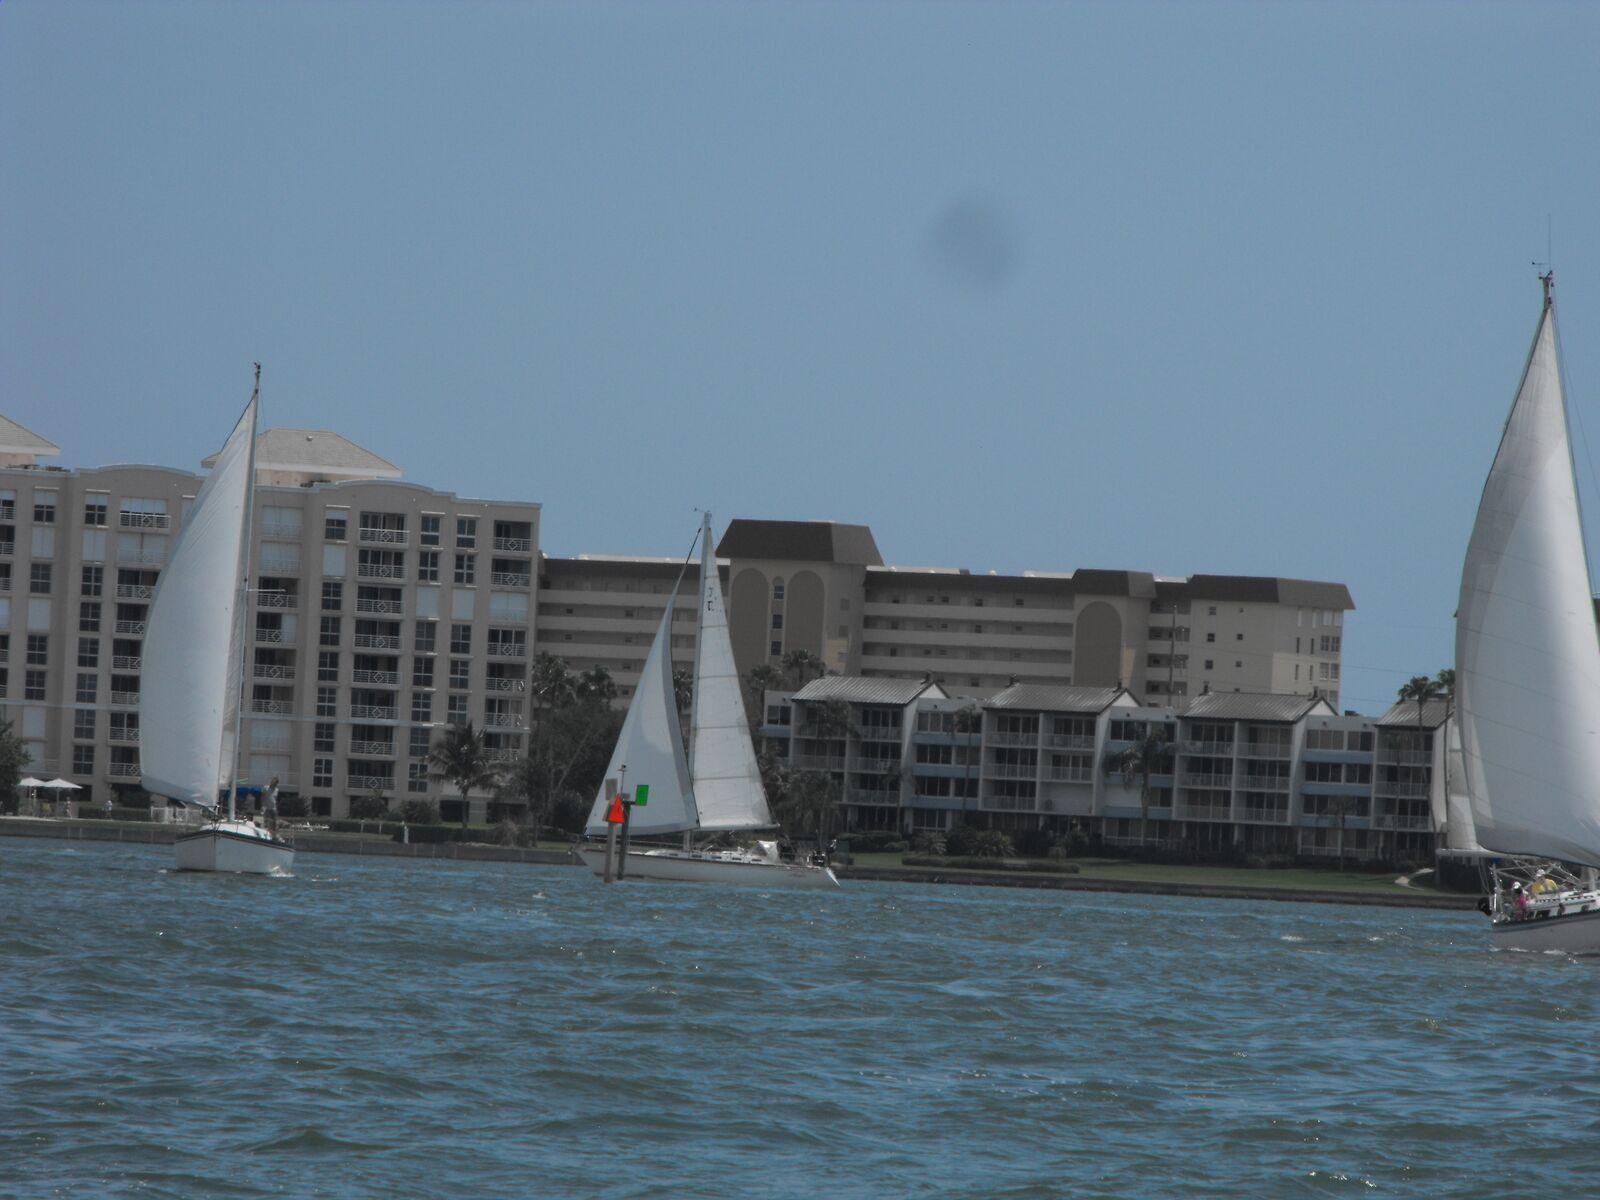 BCYC / Boca Ciega Yacht Club - Racing